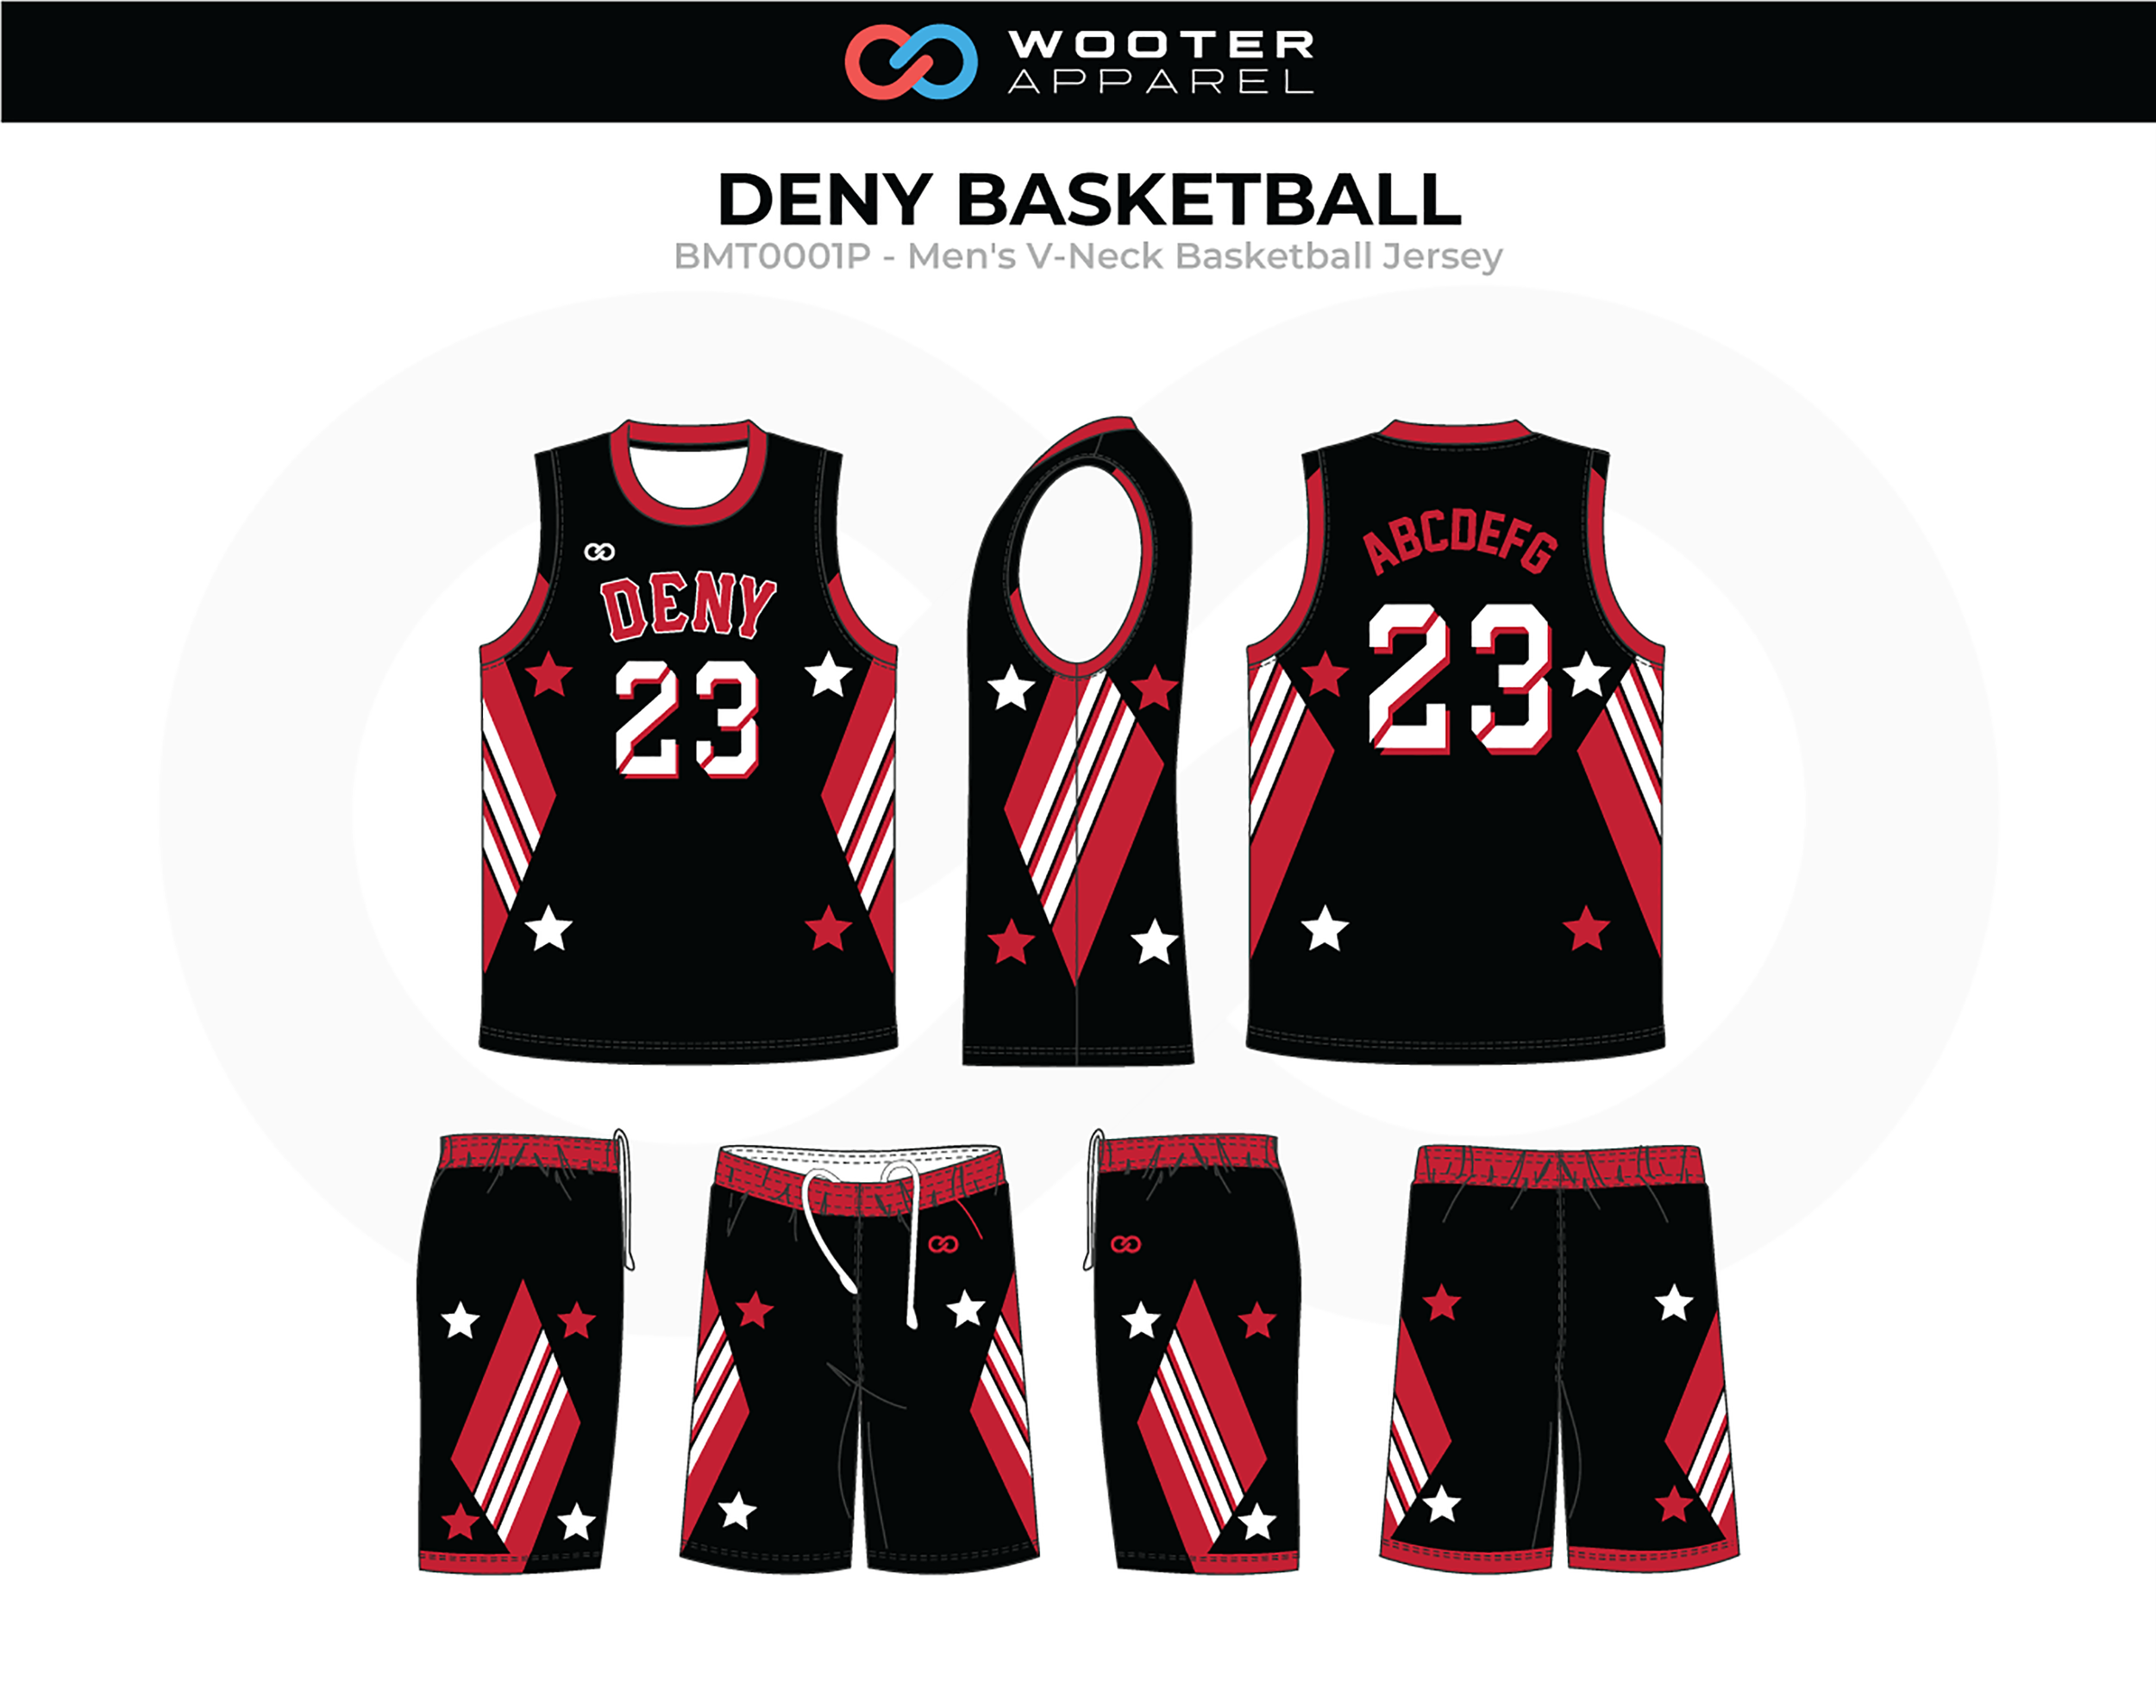 DENY Red Black White Men's V-Neck Basketball Uniform, Jersey and Shorts